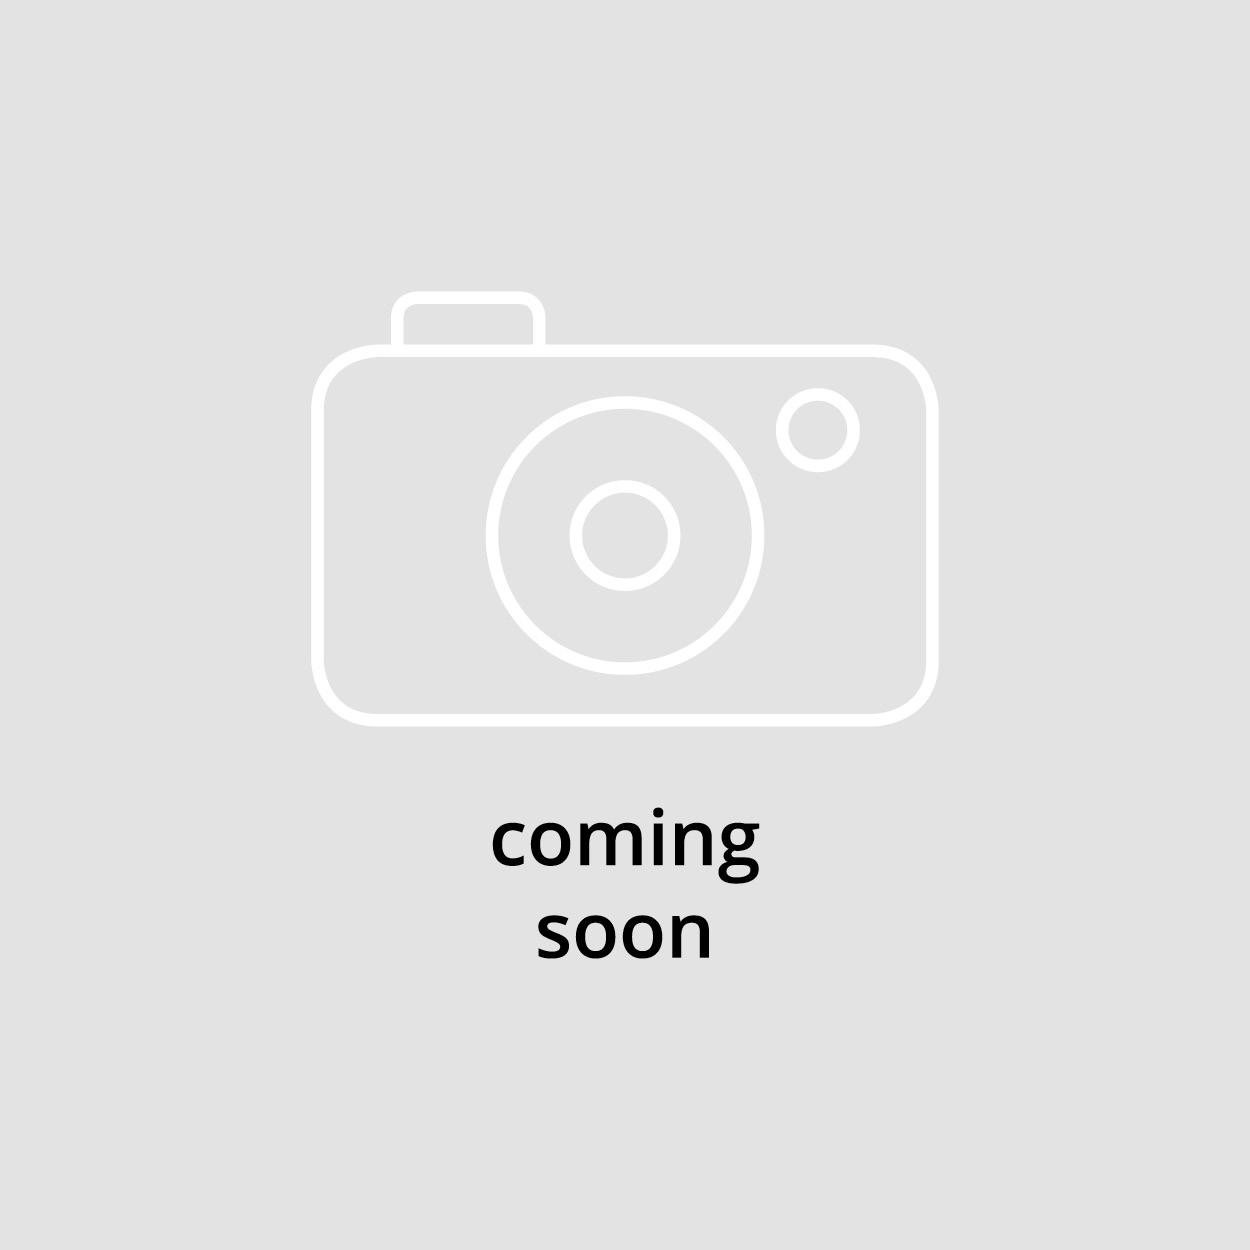 15.18.105 Anello per Giunto mandrino frontale Gildemeister AS20, GS20, GM20, GM20AC